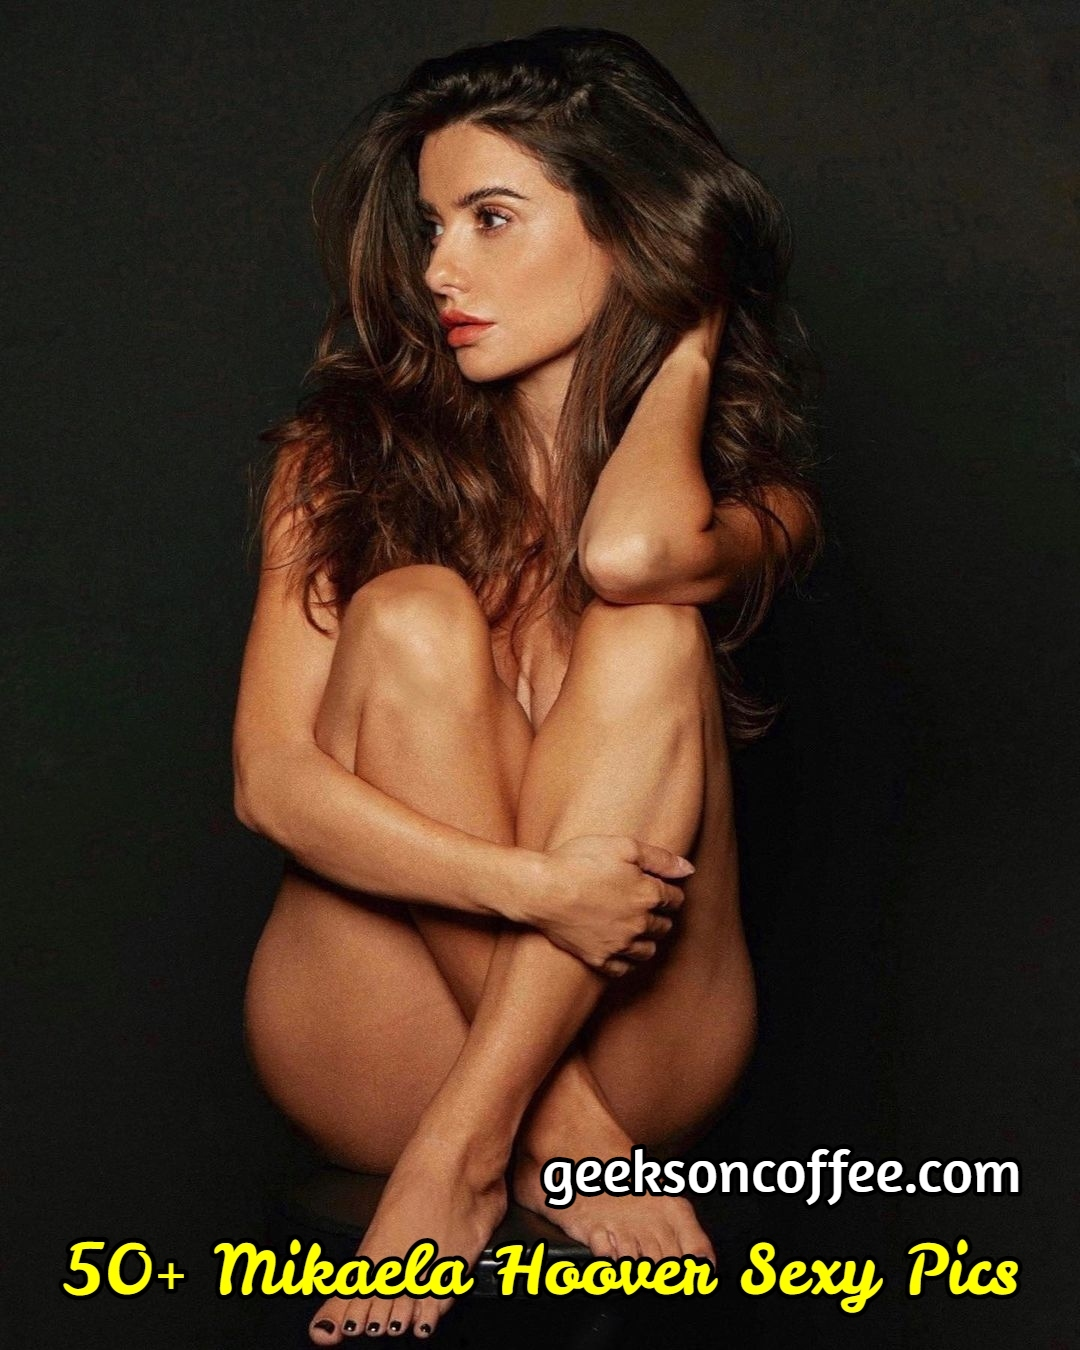 Mikaela Hoover Sexy Pics